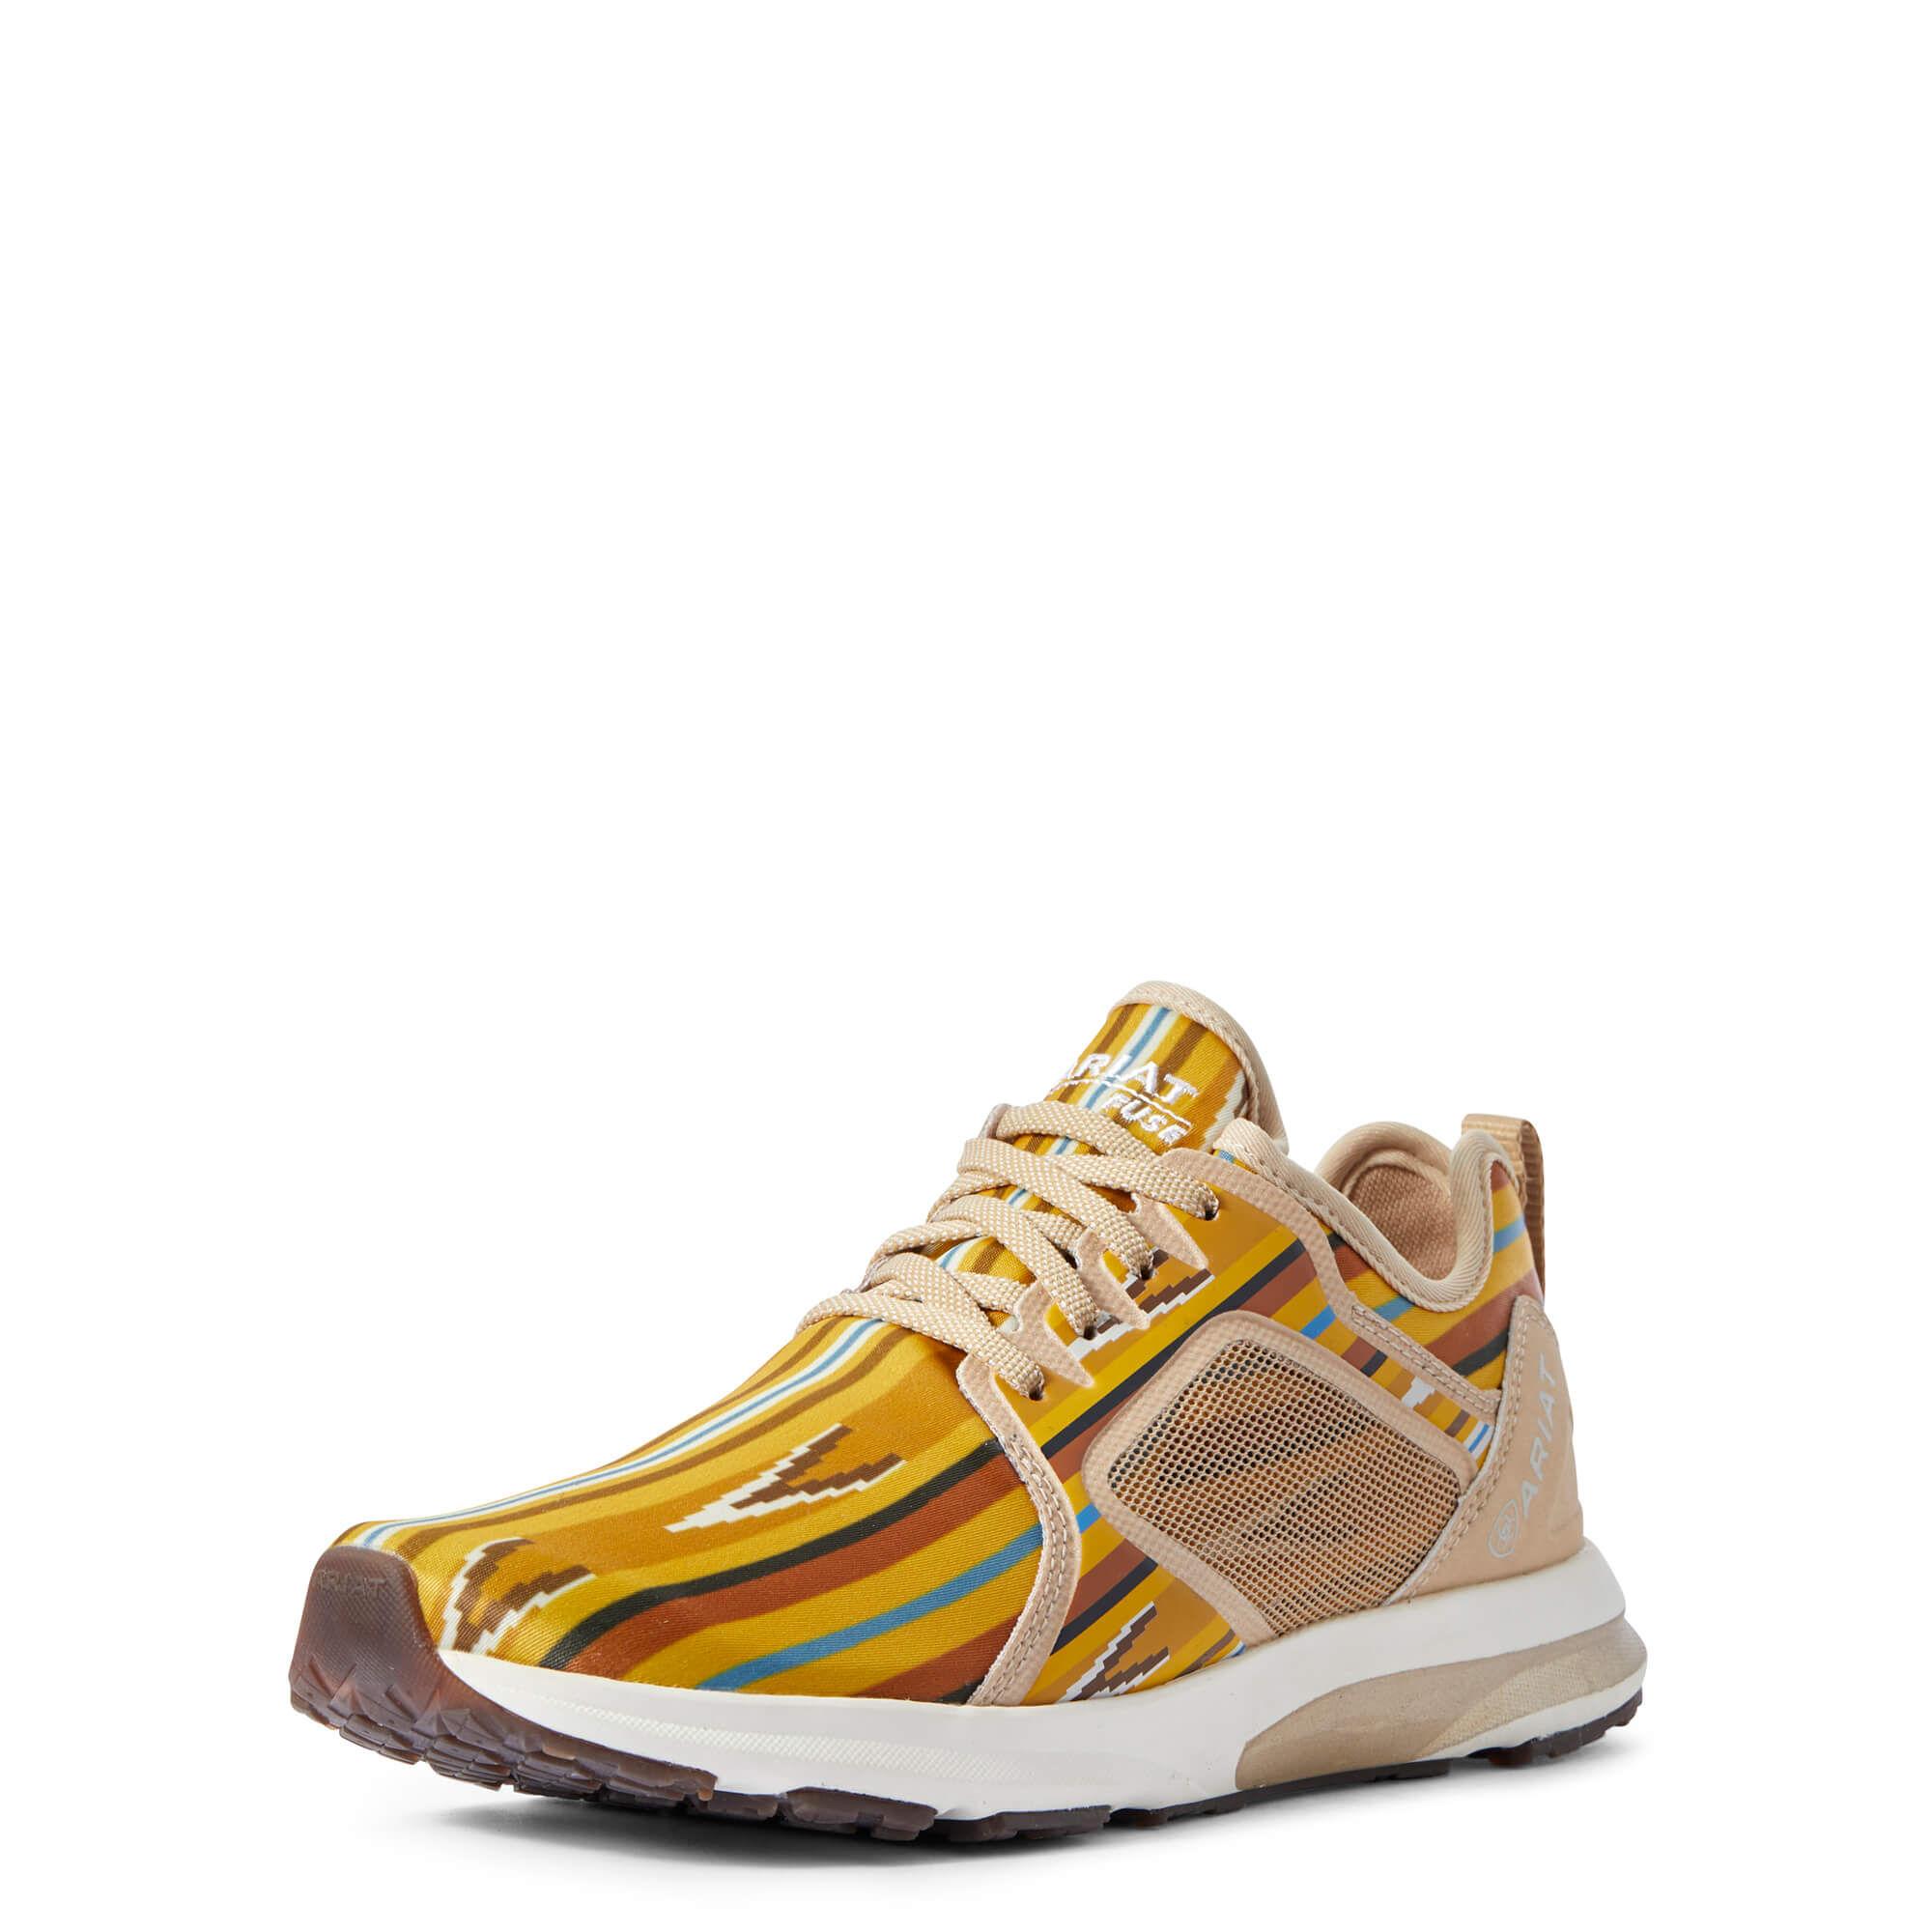 Women's Tennis Shoes \u0026 Sneakers   Ariat